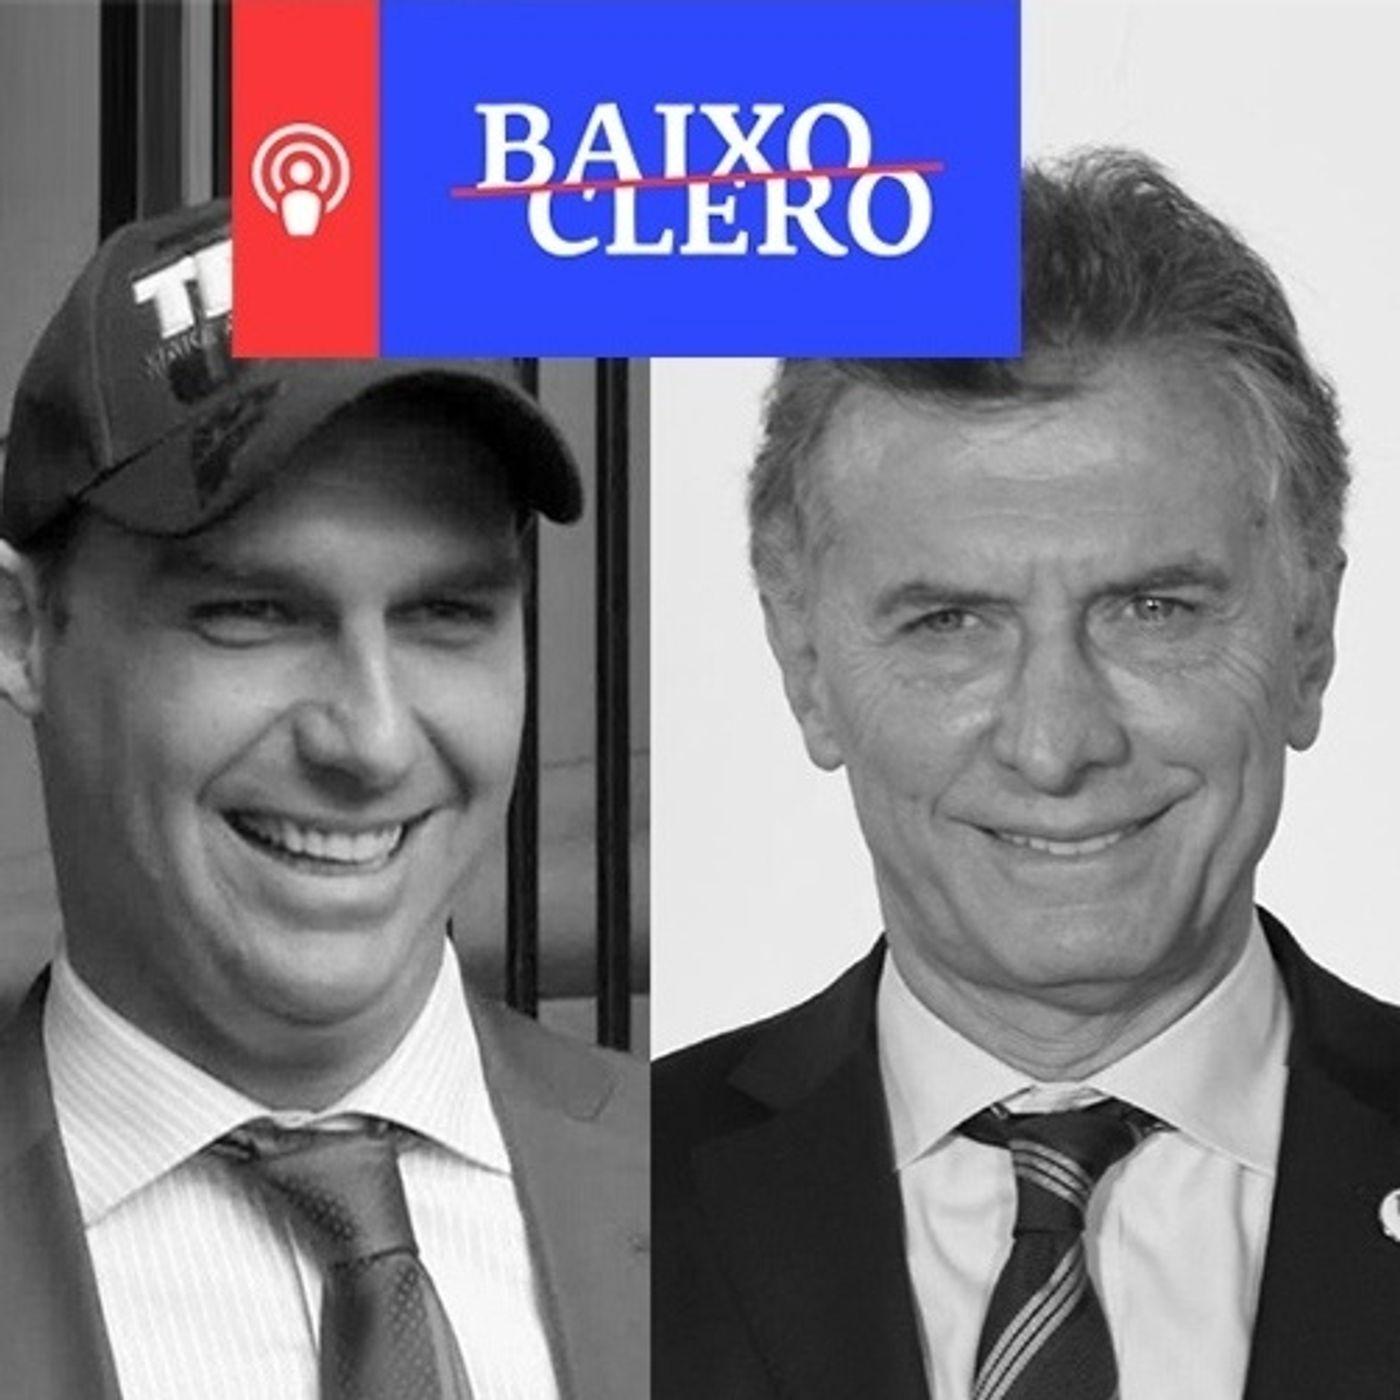 #7: Eduardo Bolsonaro vai mesmo virar embaixador dos EUA?